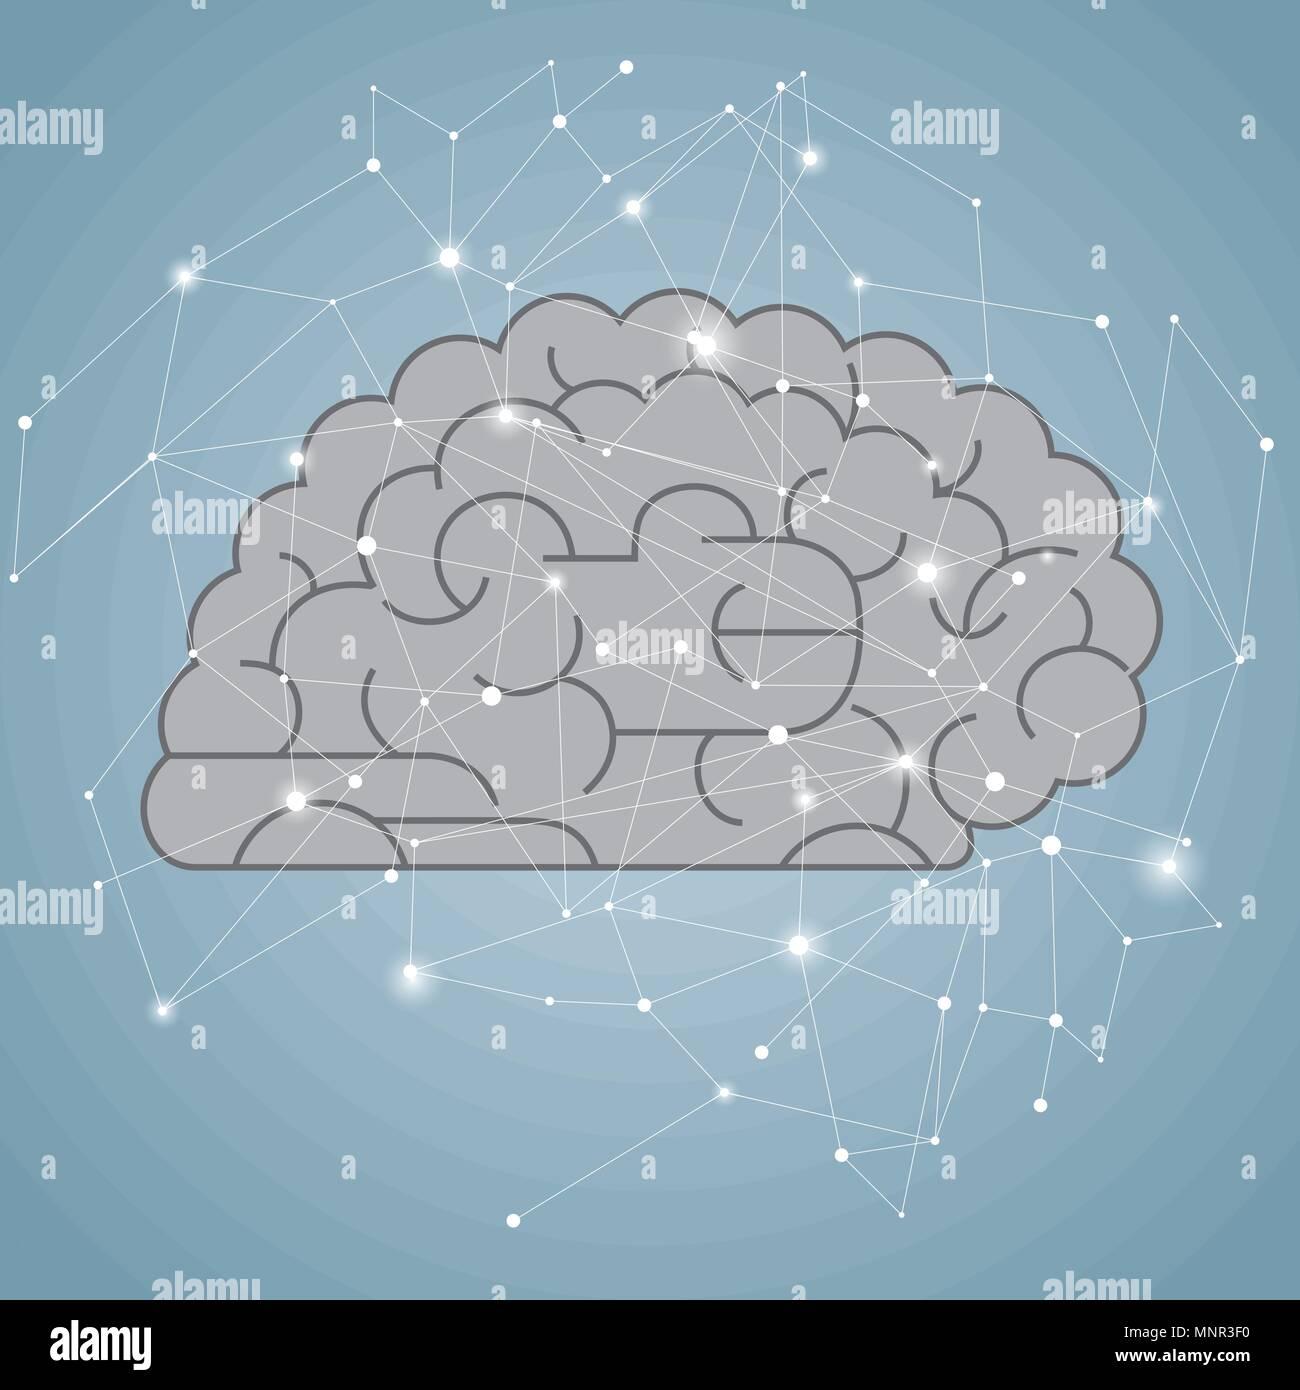 Big creative design concept, vector drawn brain graphics. - Stock Image